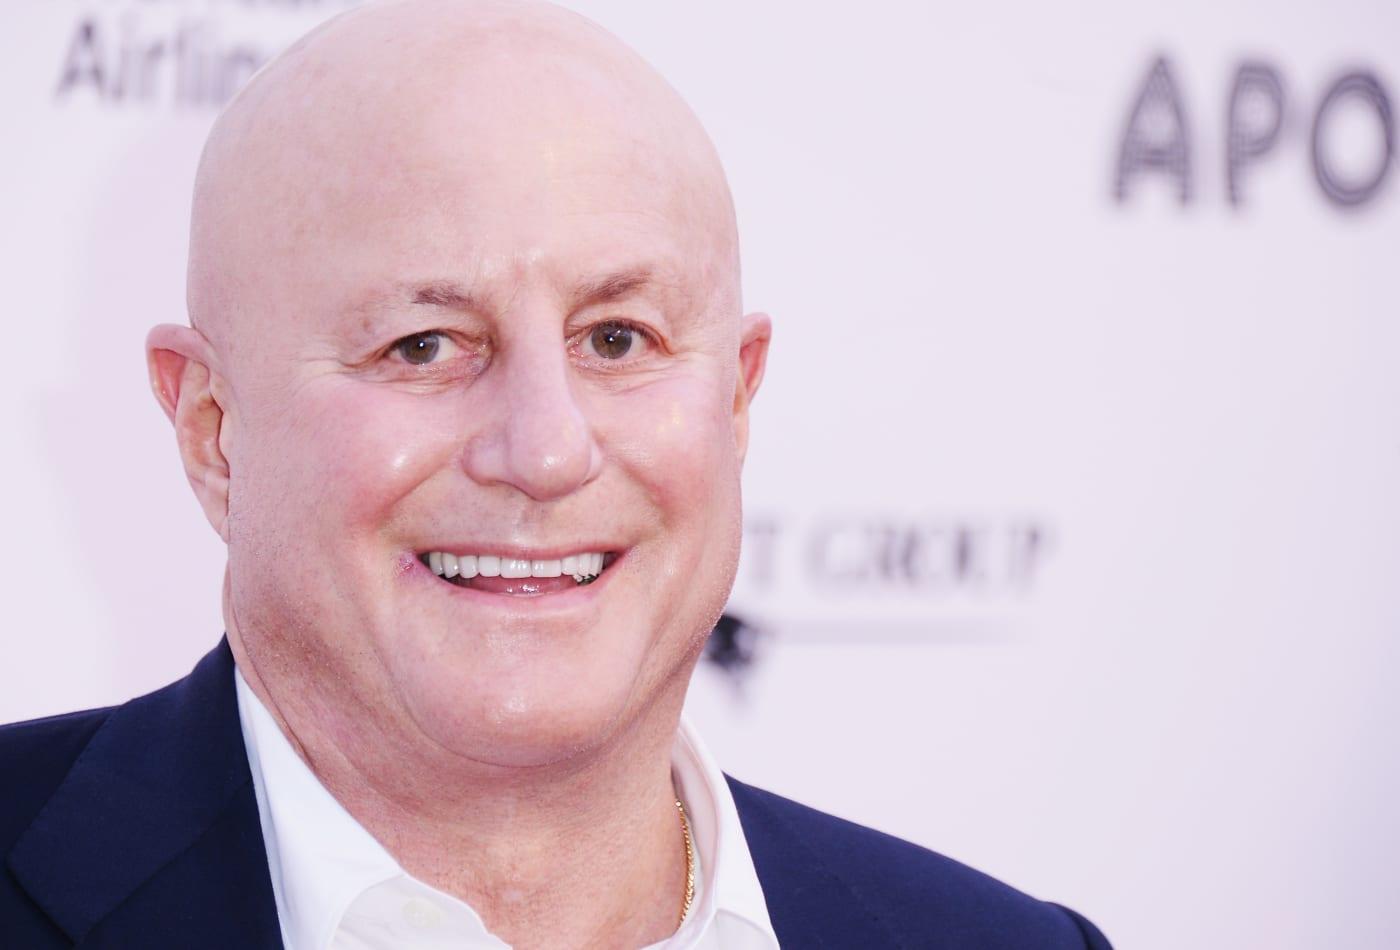 Billionaire Ron Perelman sells hundreds of millions of dollars in assets